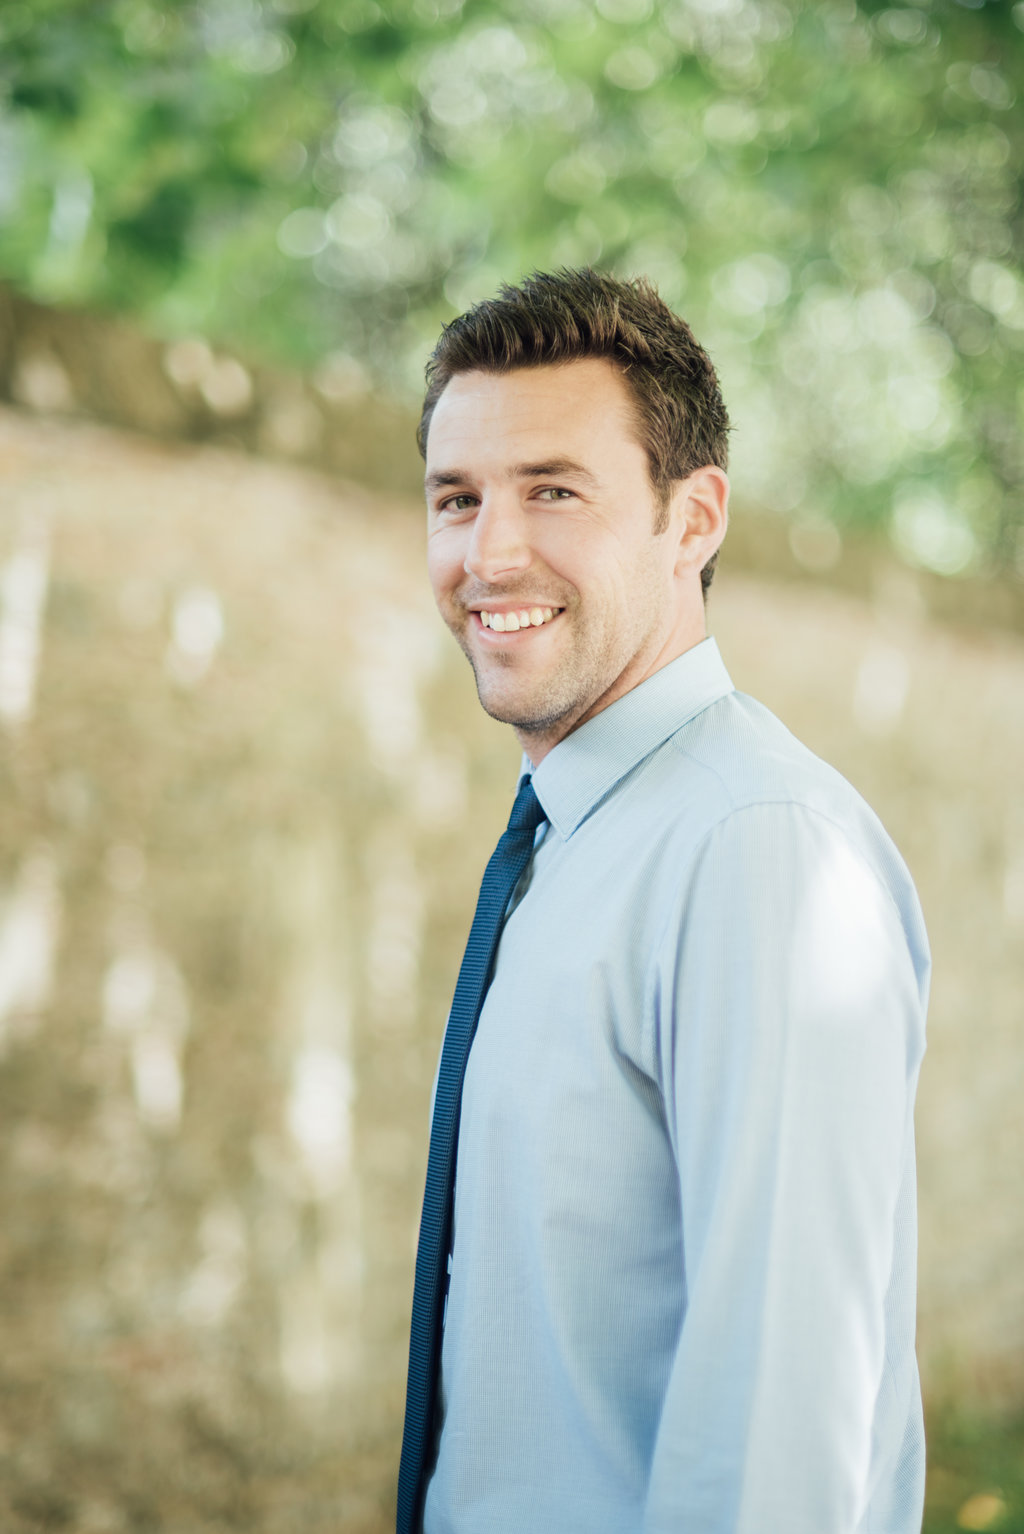 Chris Maslen Grad Dip Ba Hons